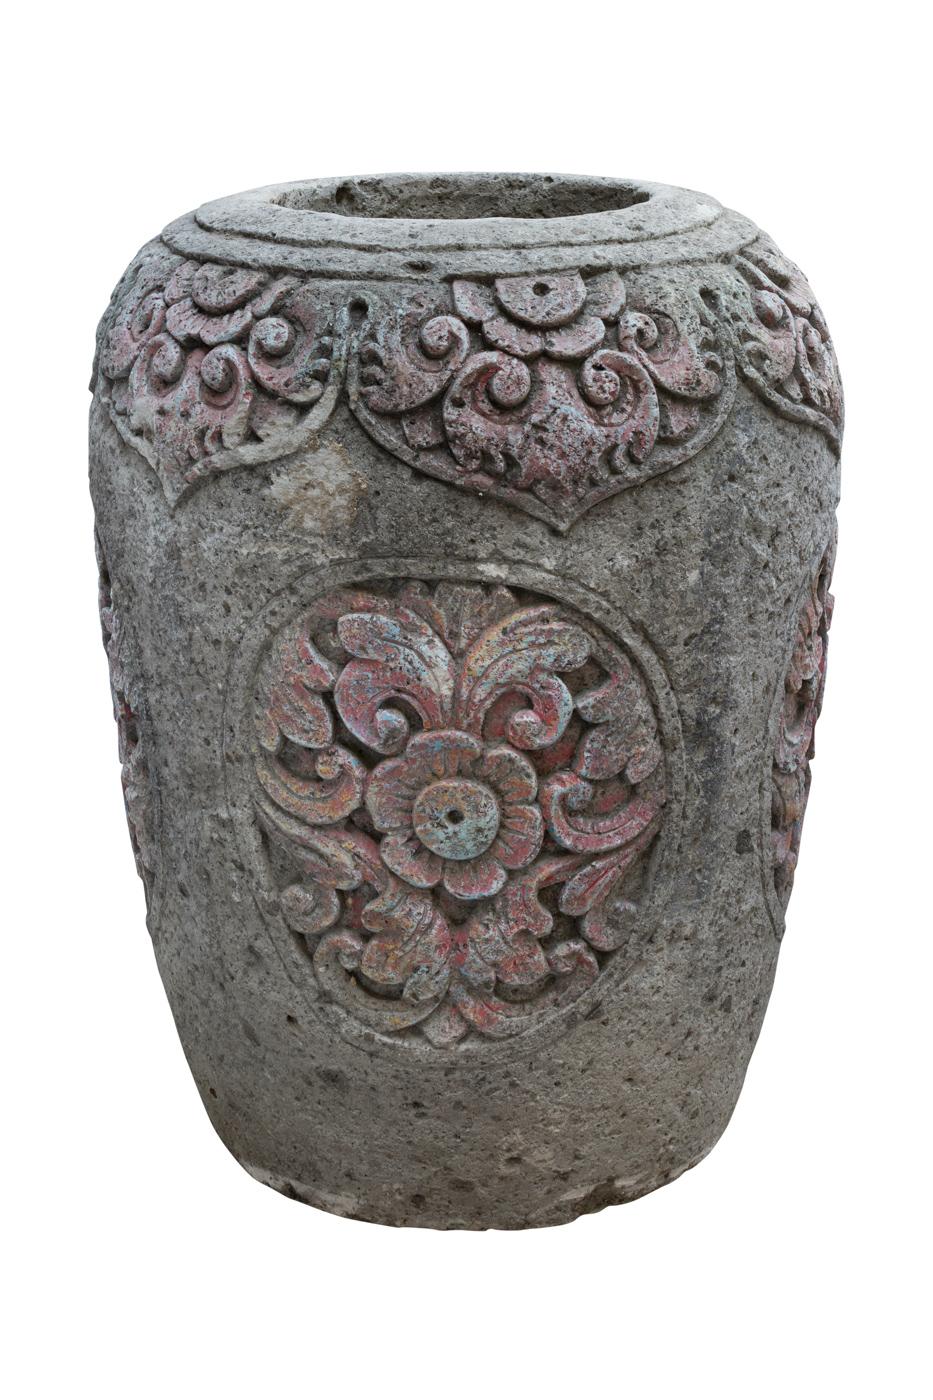 Pot carved in sandstone with floral motifs